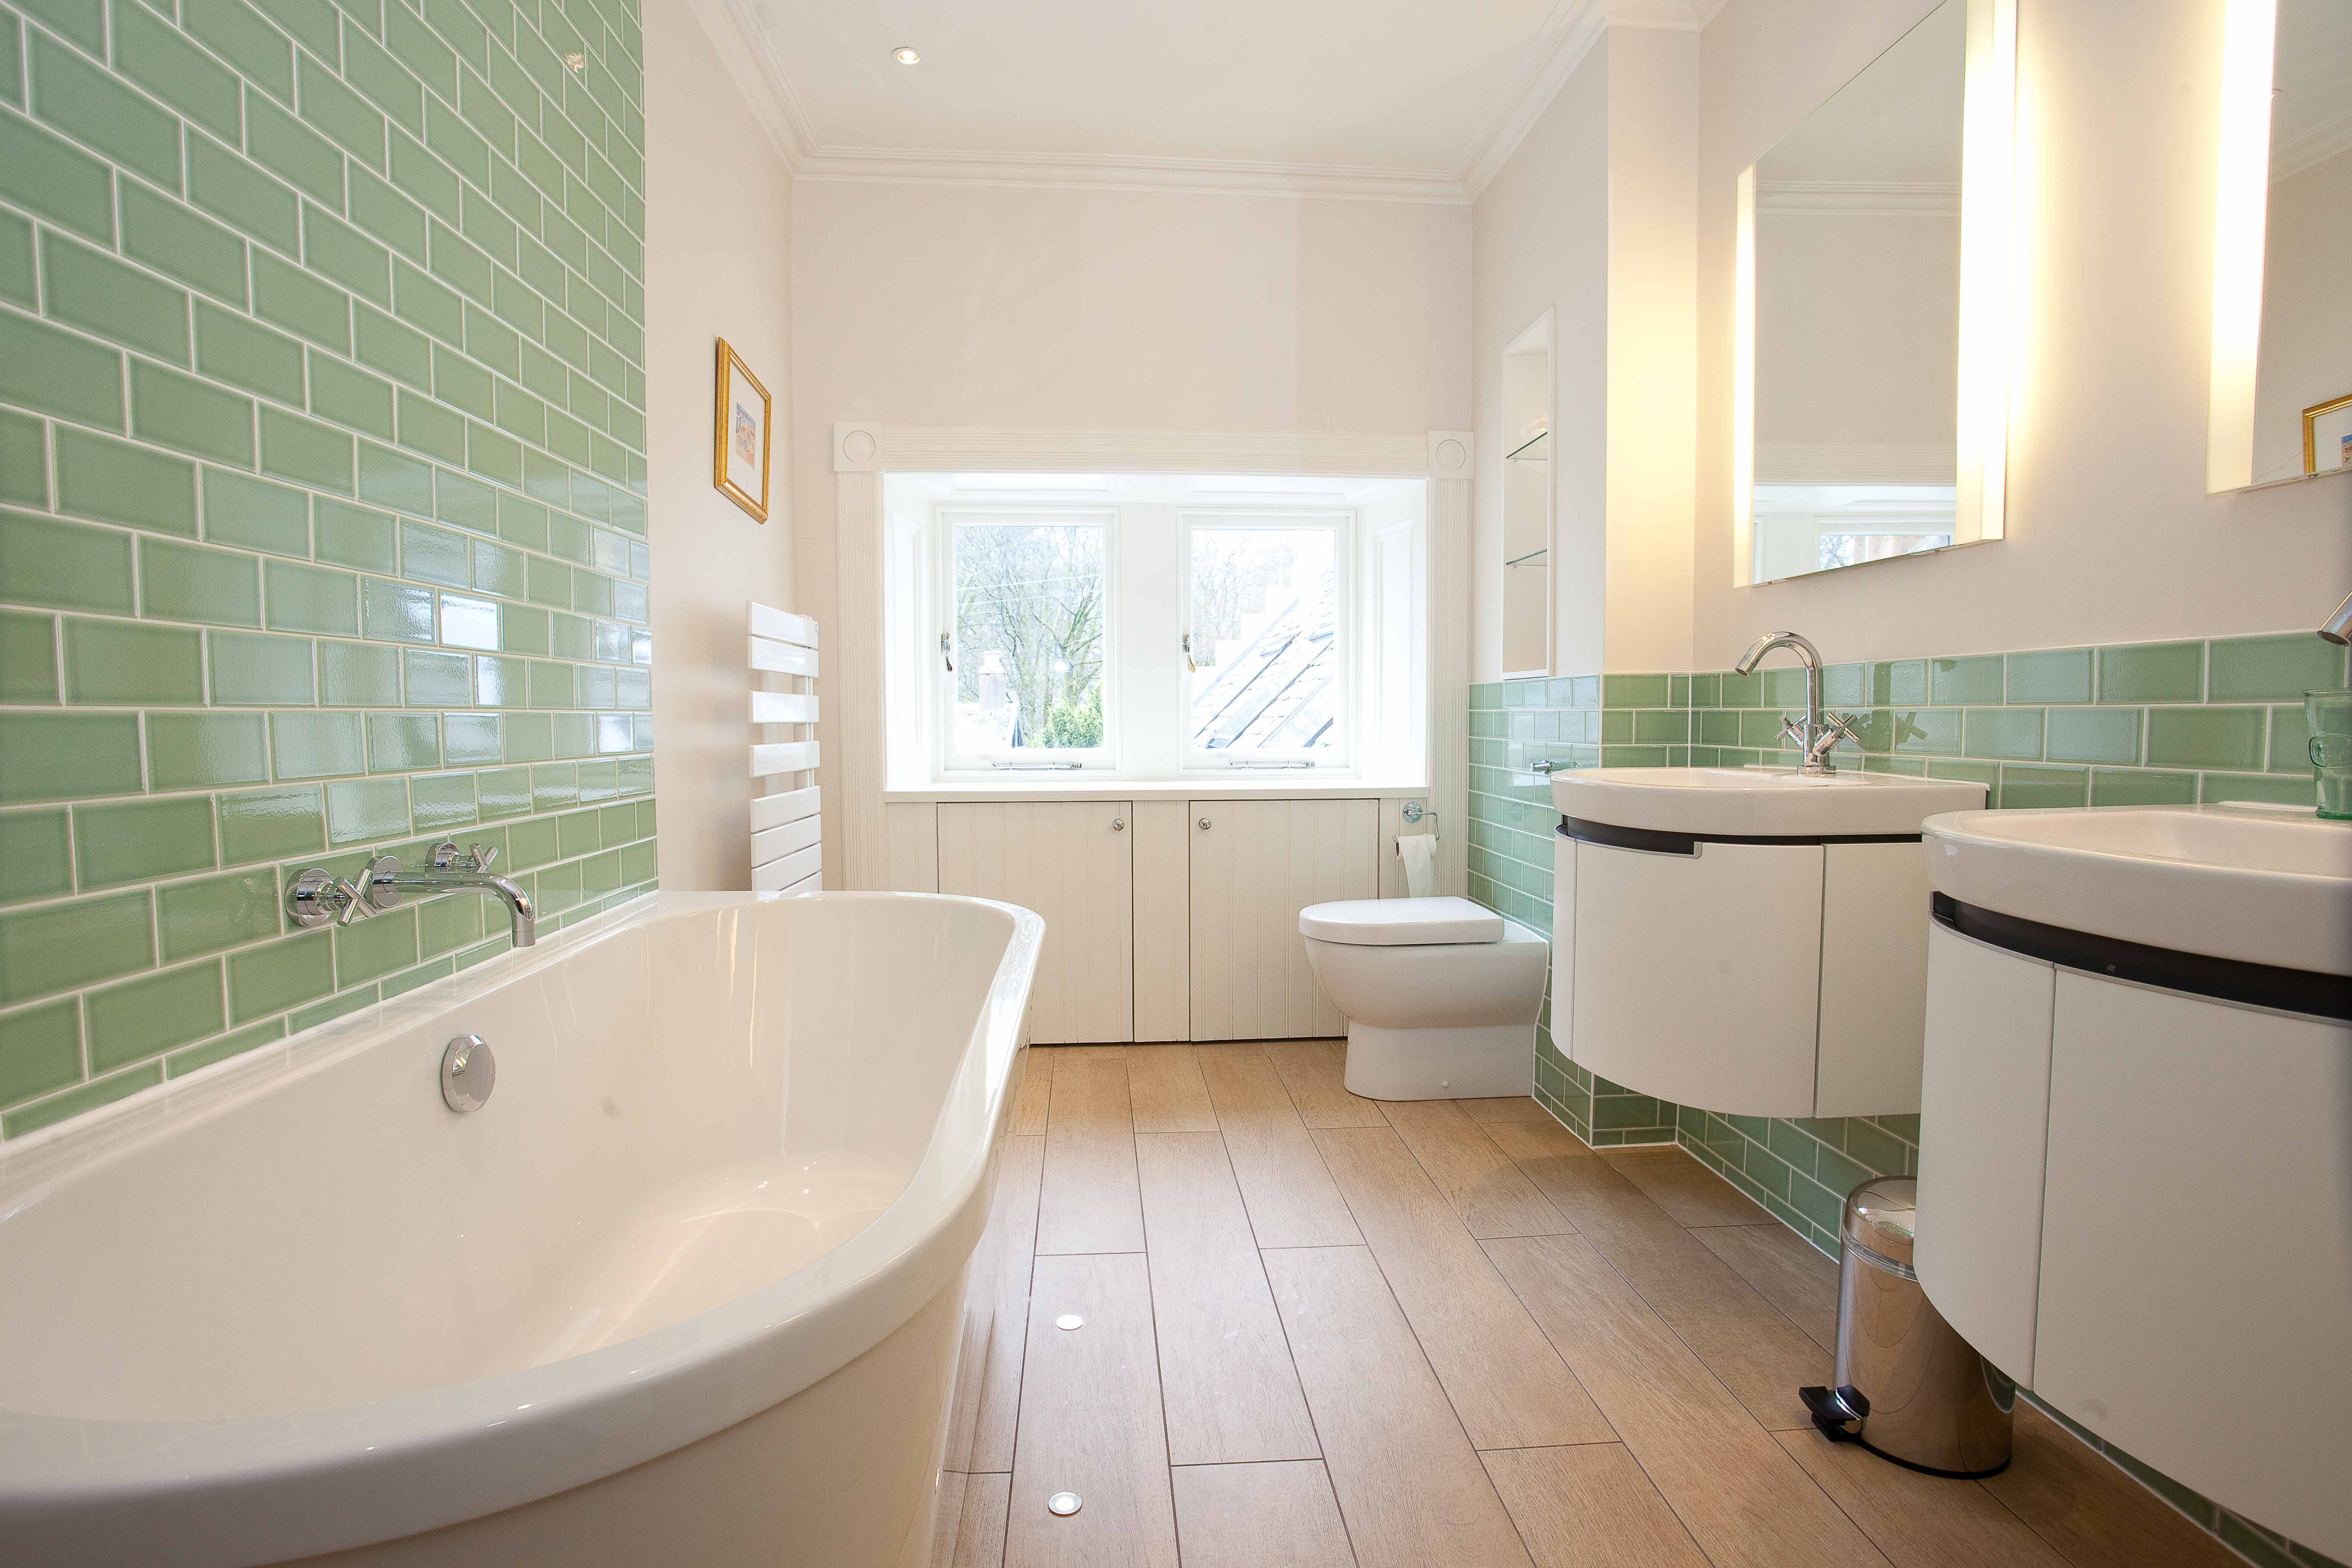 Fresh and modern Edinburgh bathroom Design with subway tiles